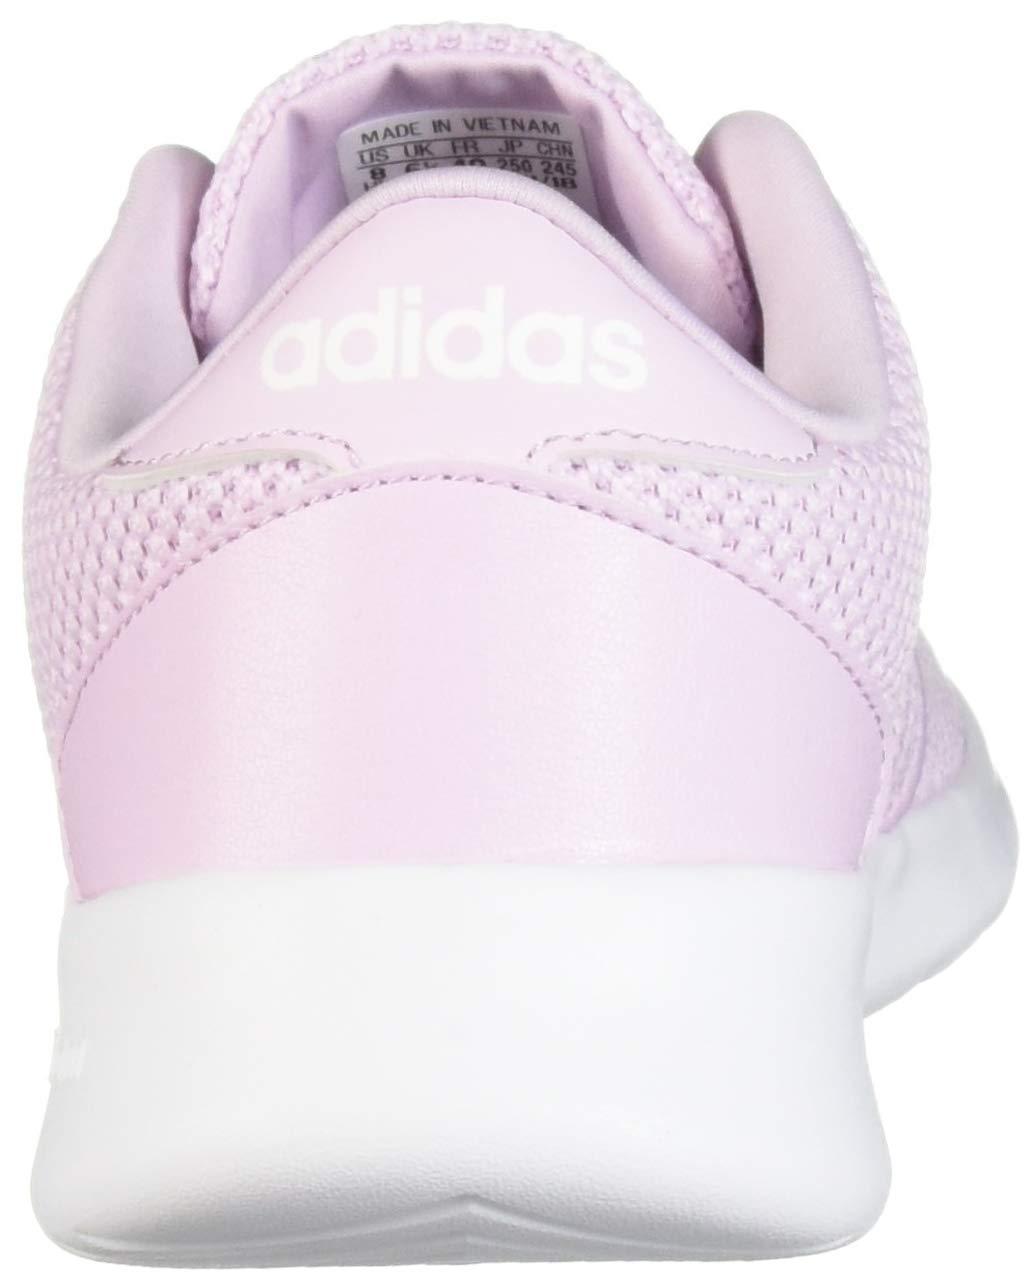 adidas Women's Cloudfoam QT Racer, White/aero Pink, 5.5 M US by adidas (Image #2)